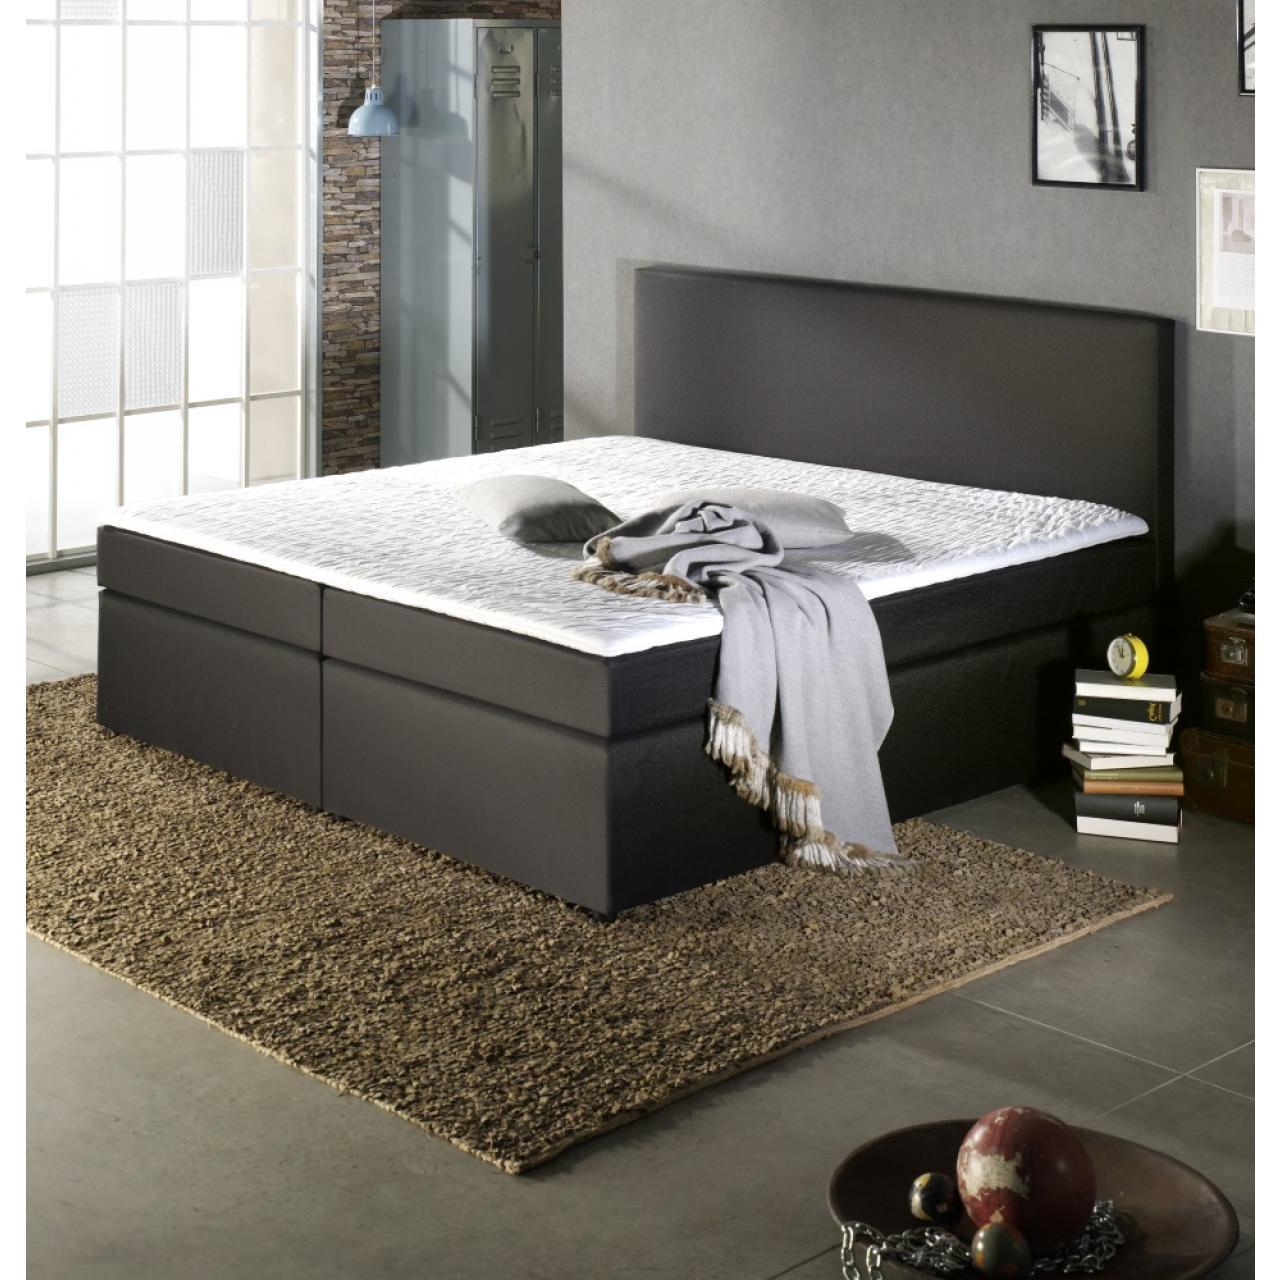 boxspringbett bx830 180x200 boxspringbett betten schlafen m bel j hnichen center gmbh. Black Bedroom Furniture Sets. Home Design Ideas